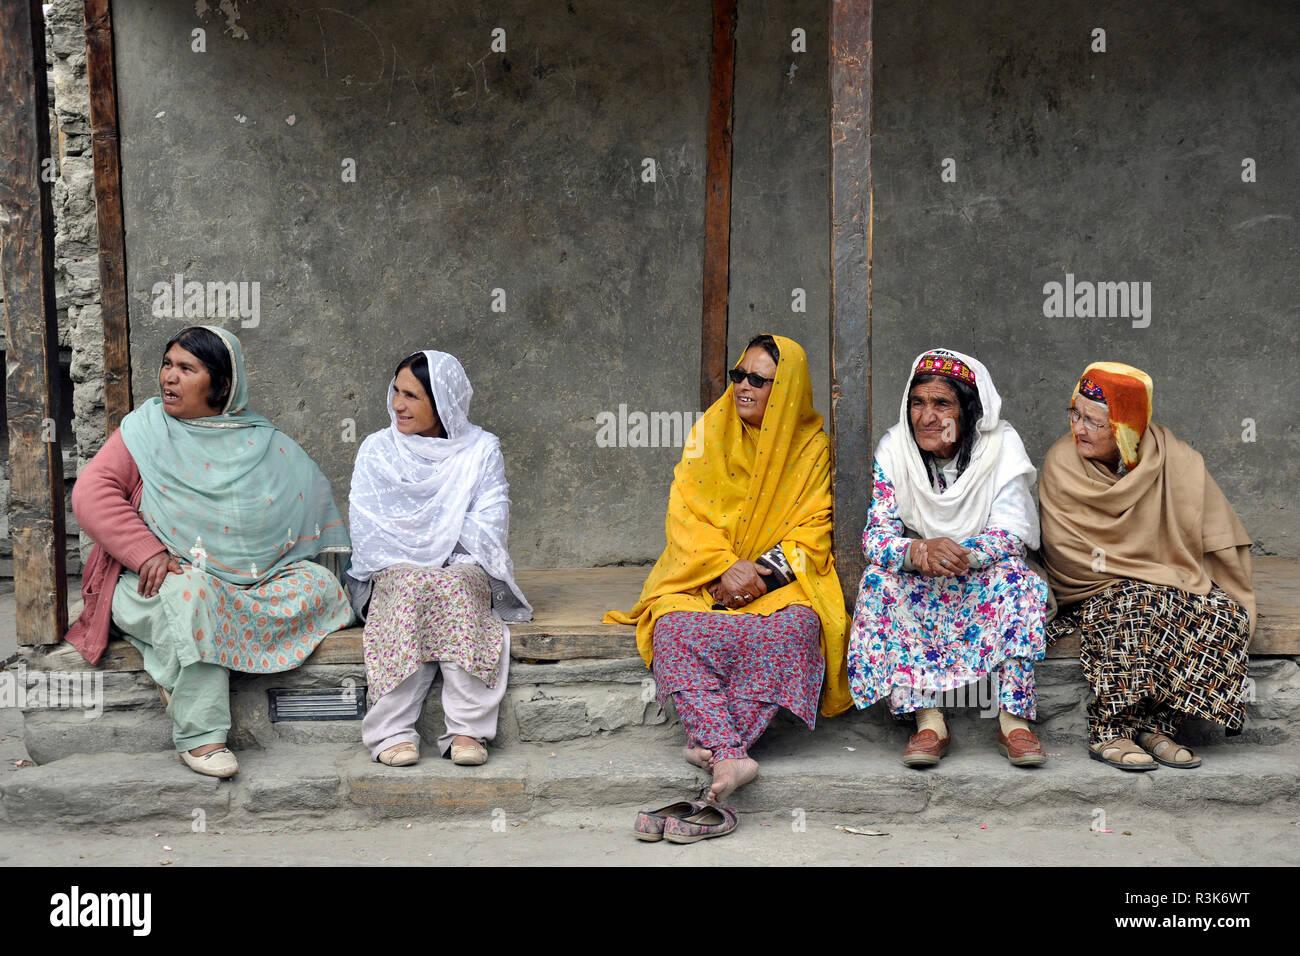 Pakistan, Karimabad village - Stock Image